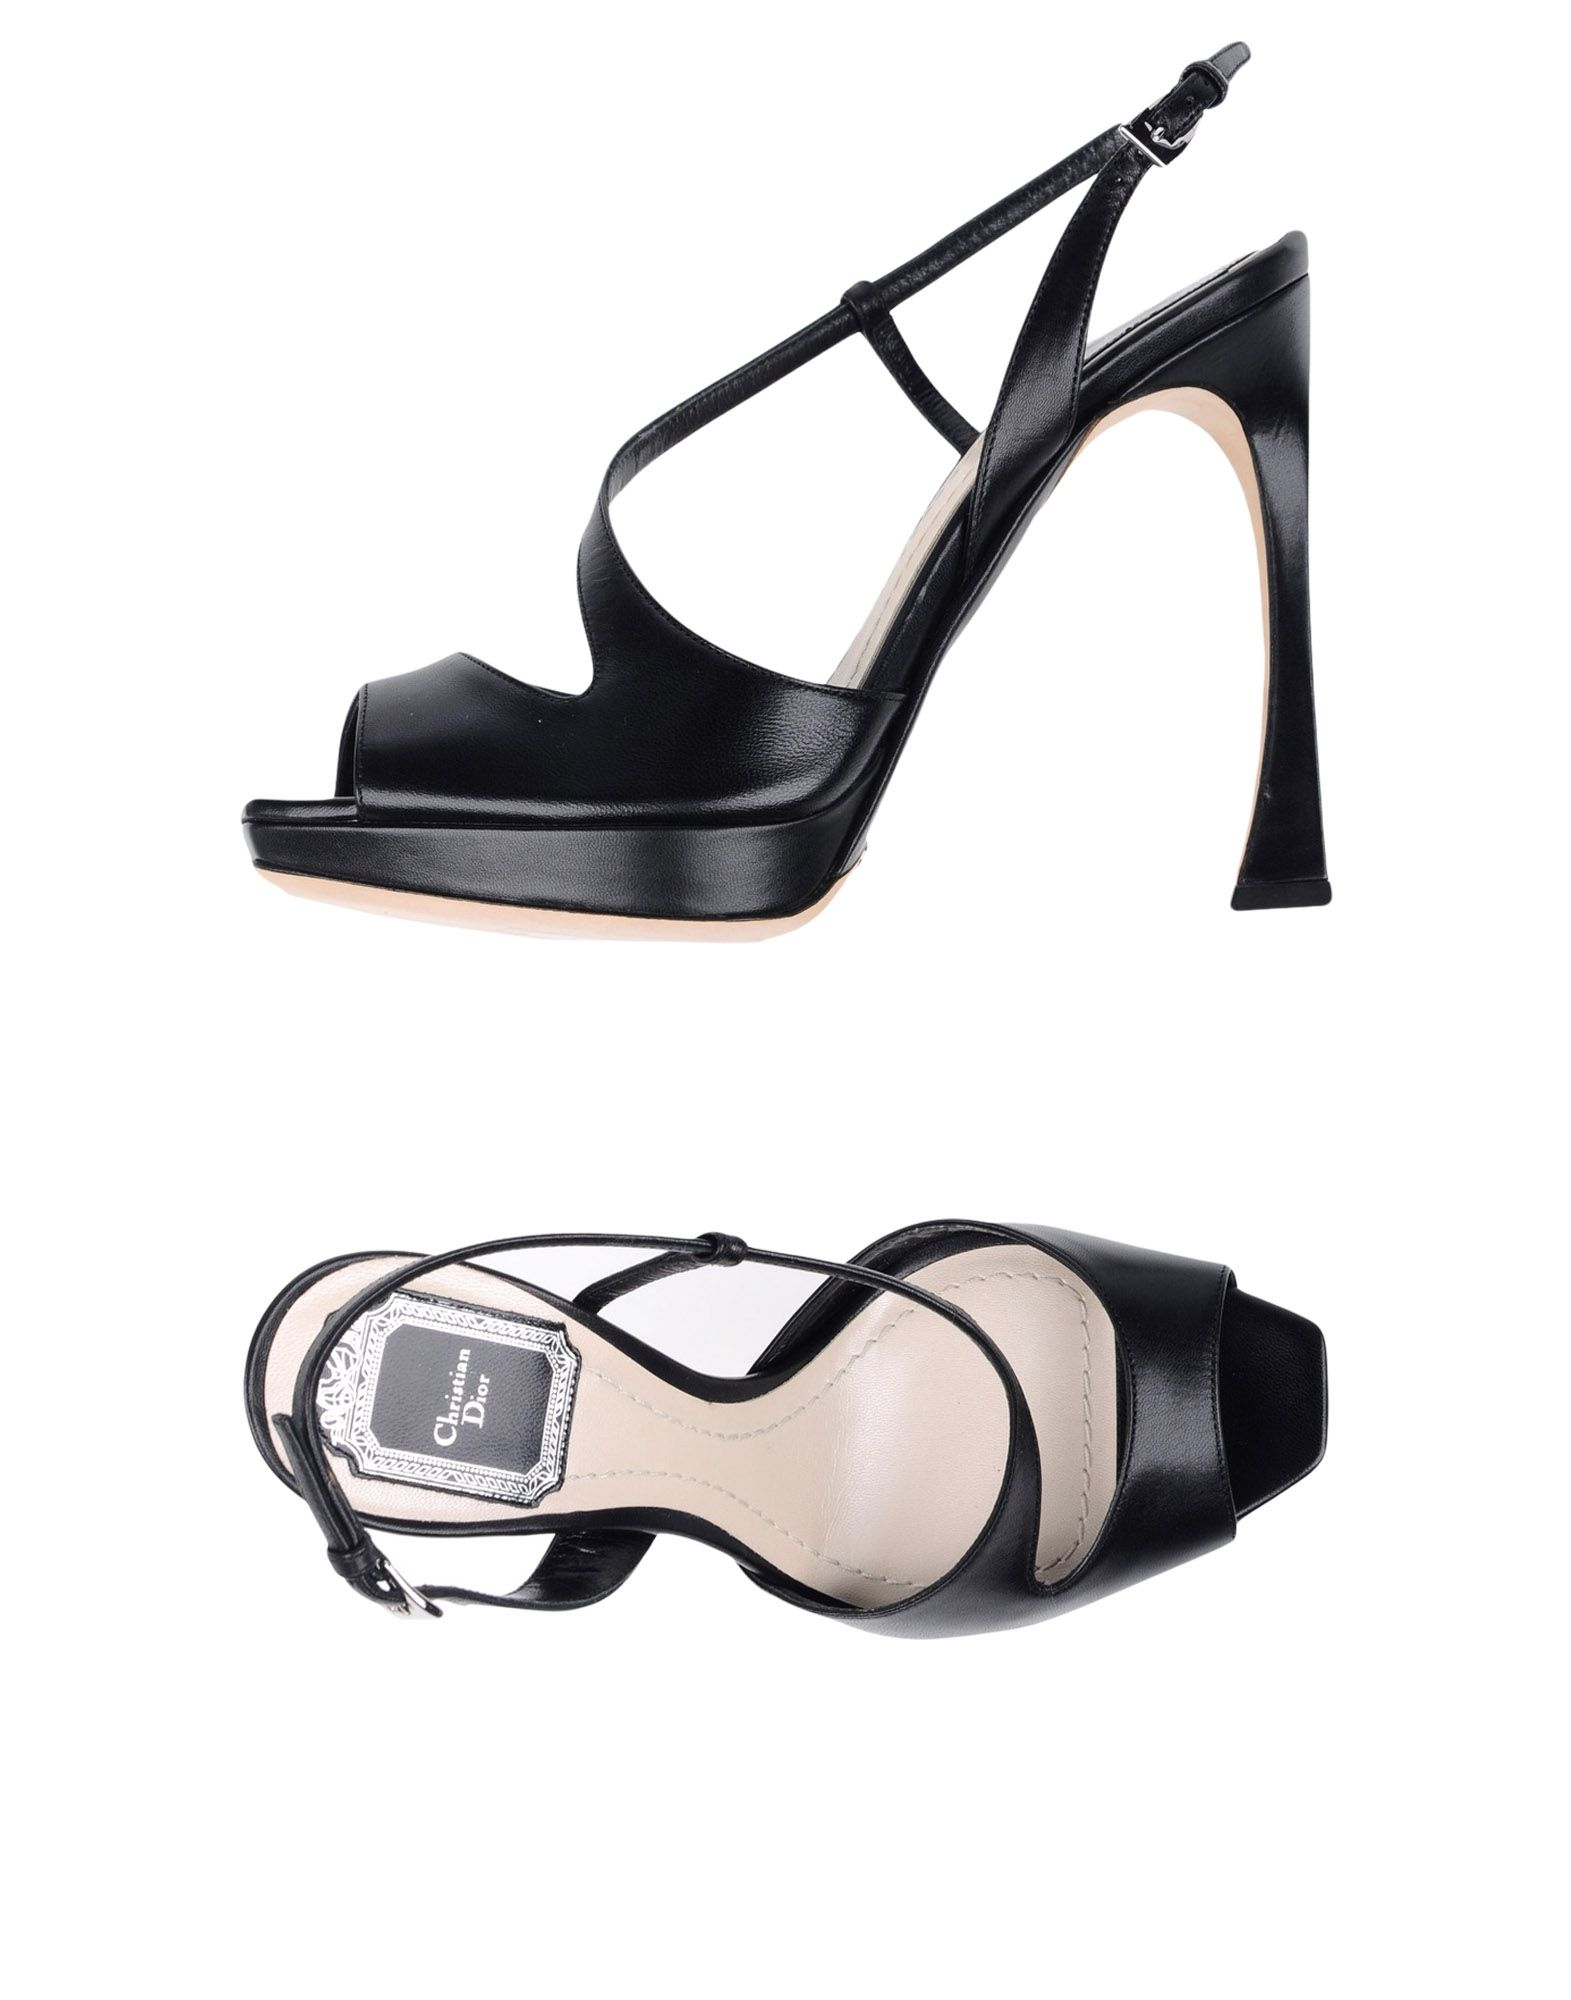 Sandali Dior Donna - Acquista online su